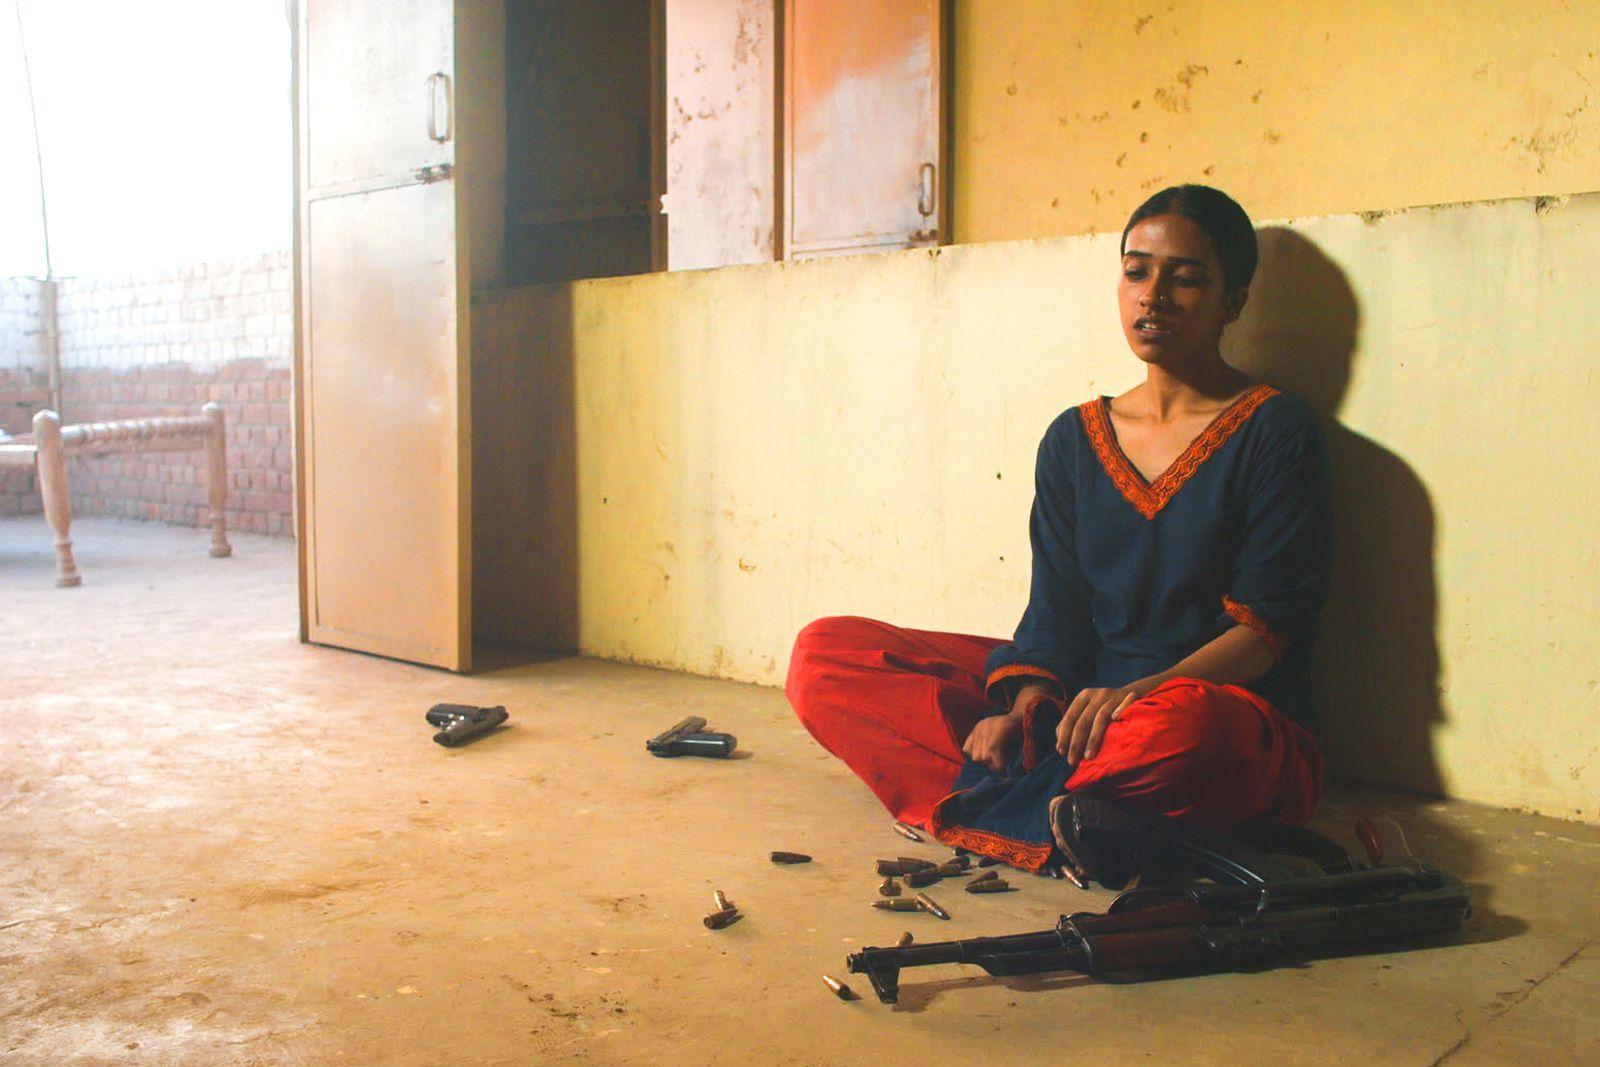 My pure land (BANDE-ANNONCE) de Sarmad Masud - Le 30 mai 2018 au cinéma